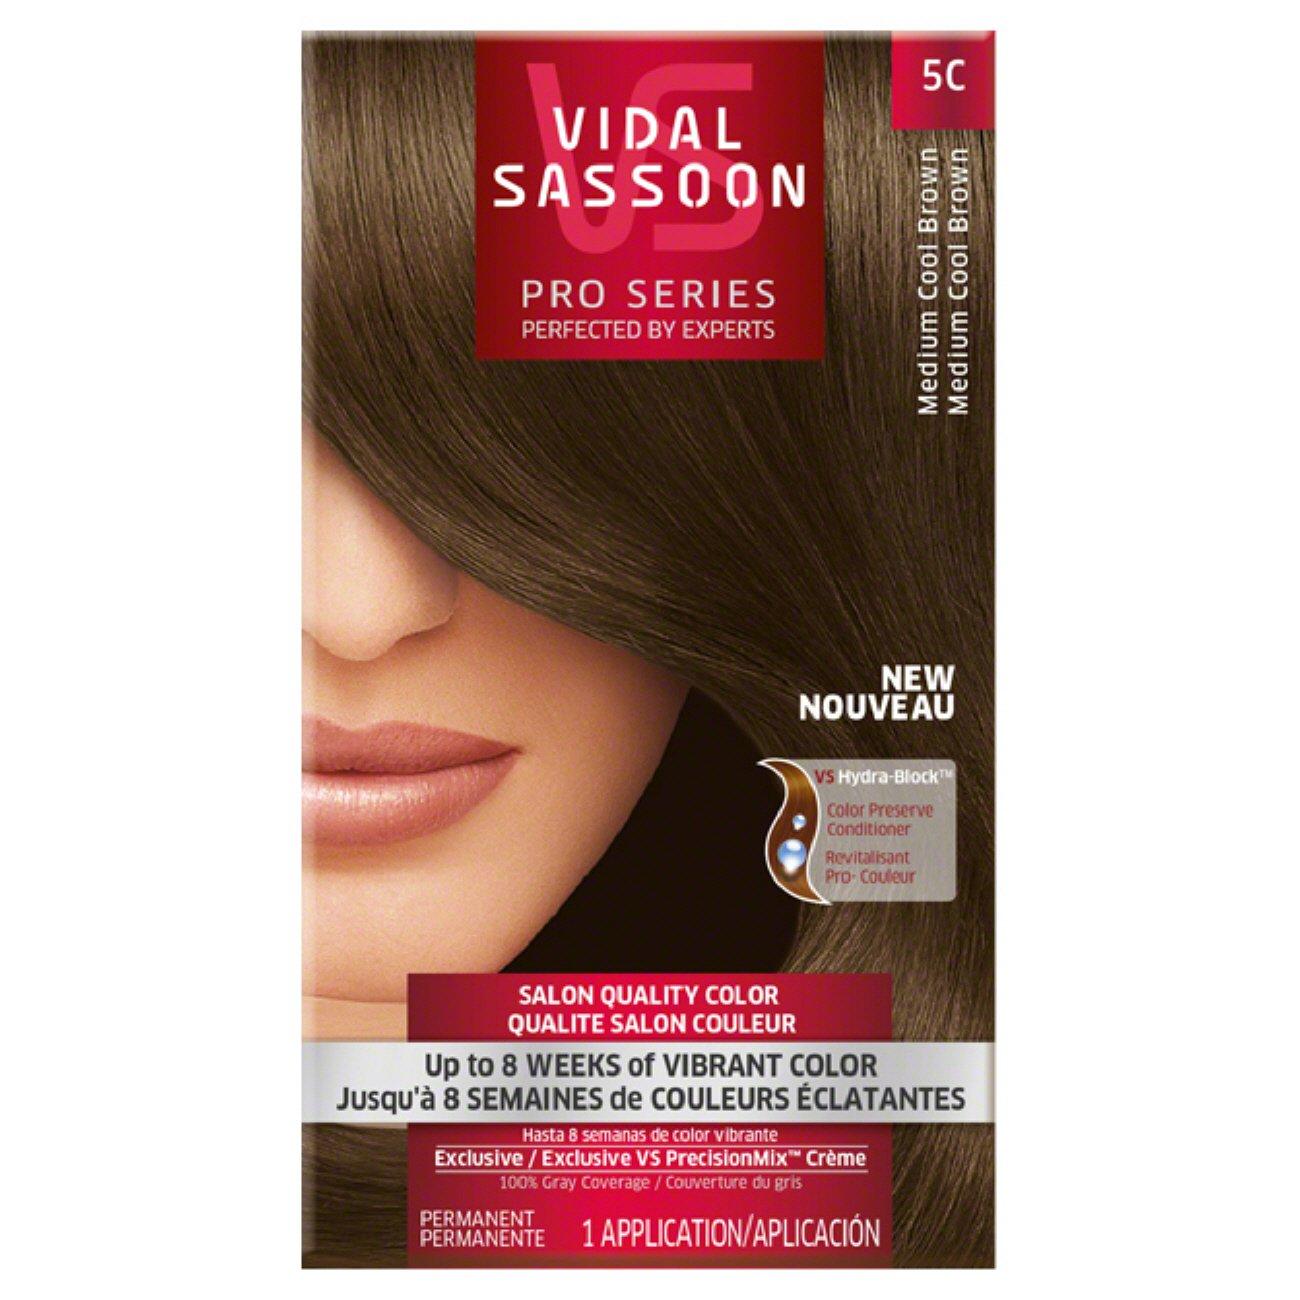 Vidal Sassoon Pro Series 5c Medium Cool Brown Hair Color Shop